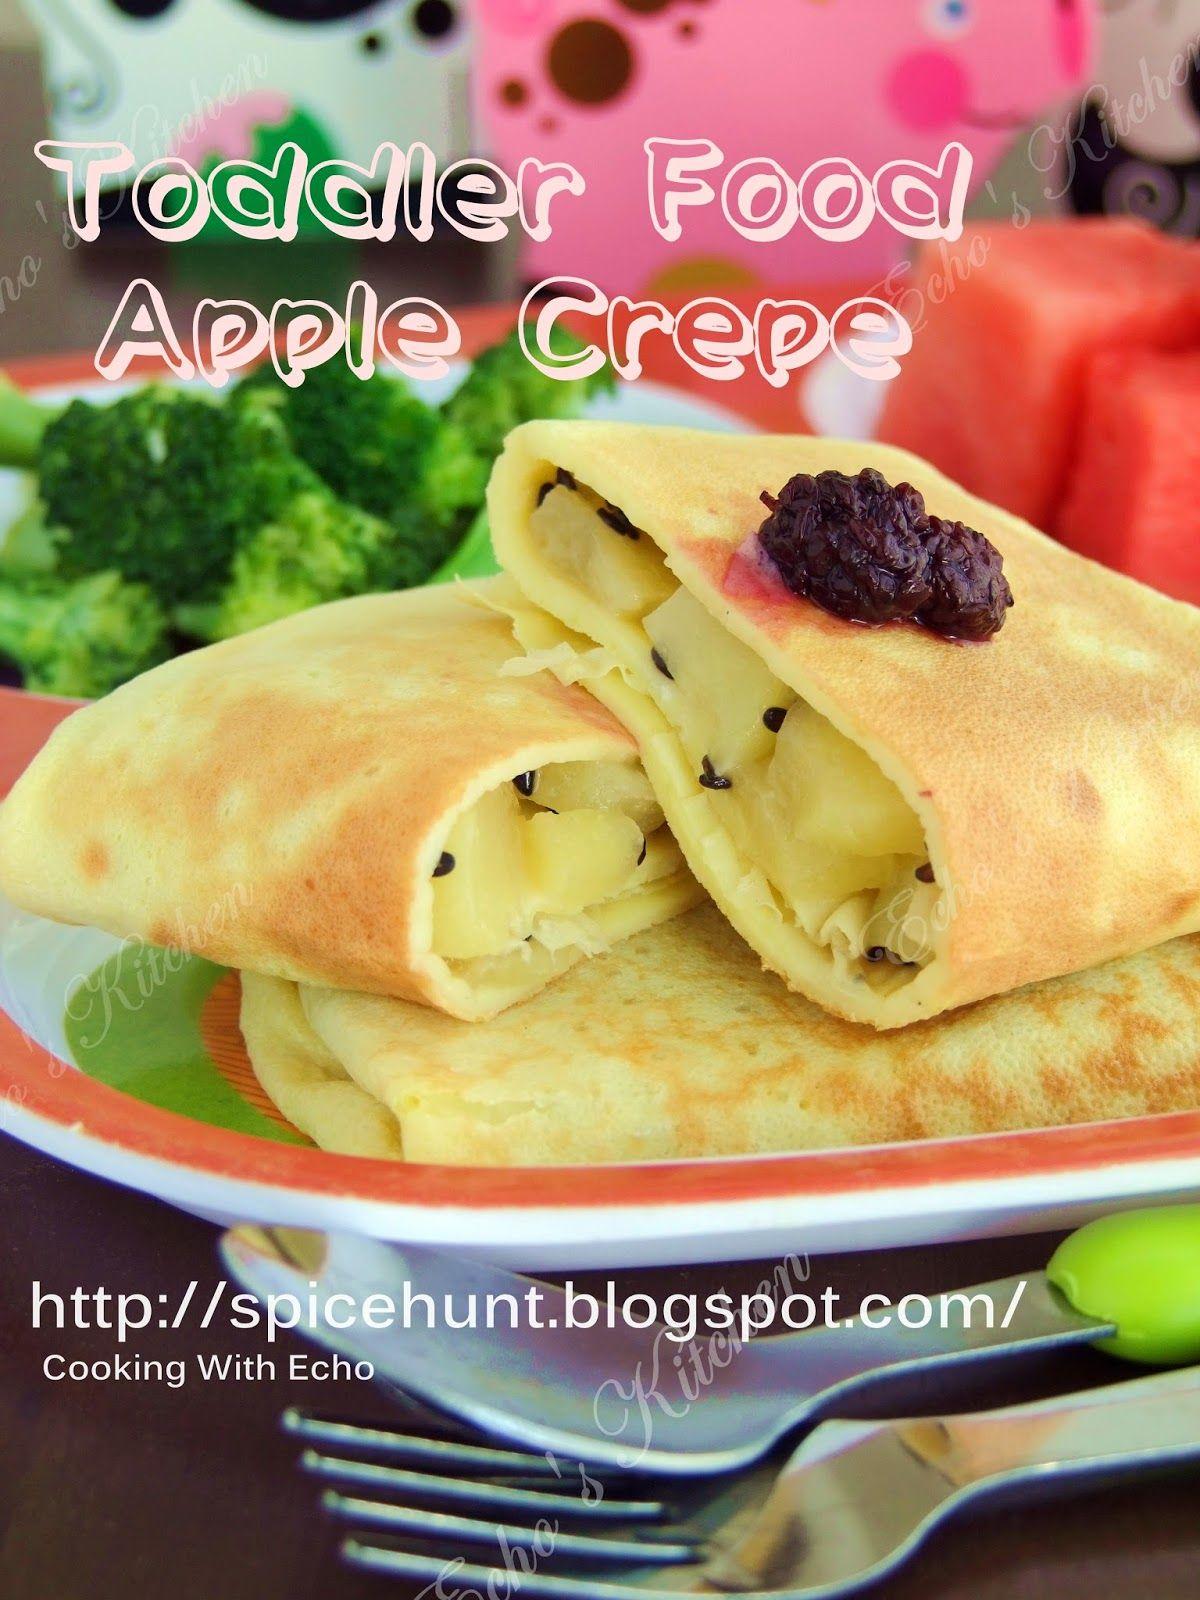 Toddler Food -- Apple Crepe